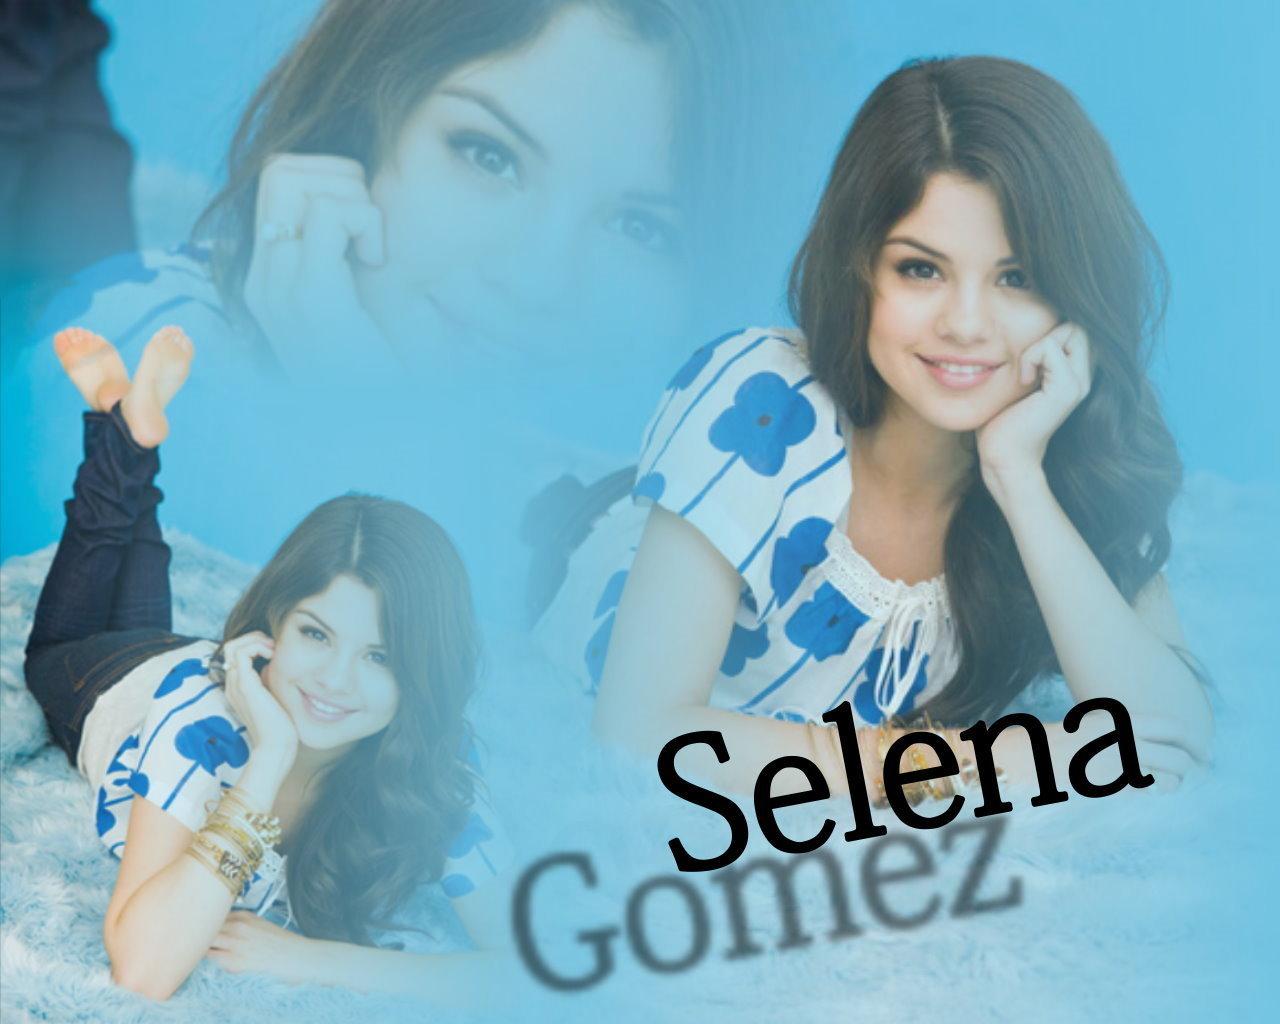 selena gomez wallpaper   Selena Gomez Wallpaper 6770520 1280x1024